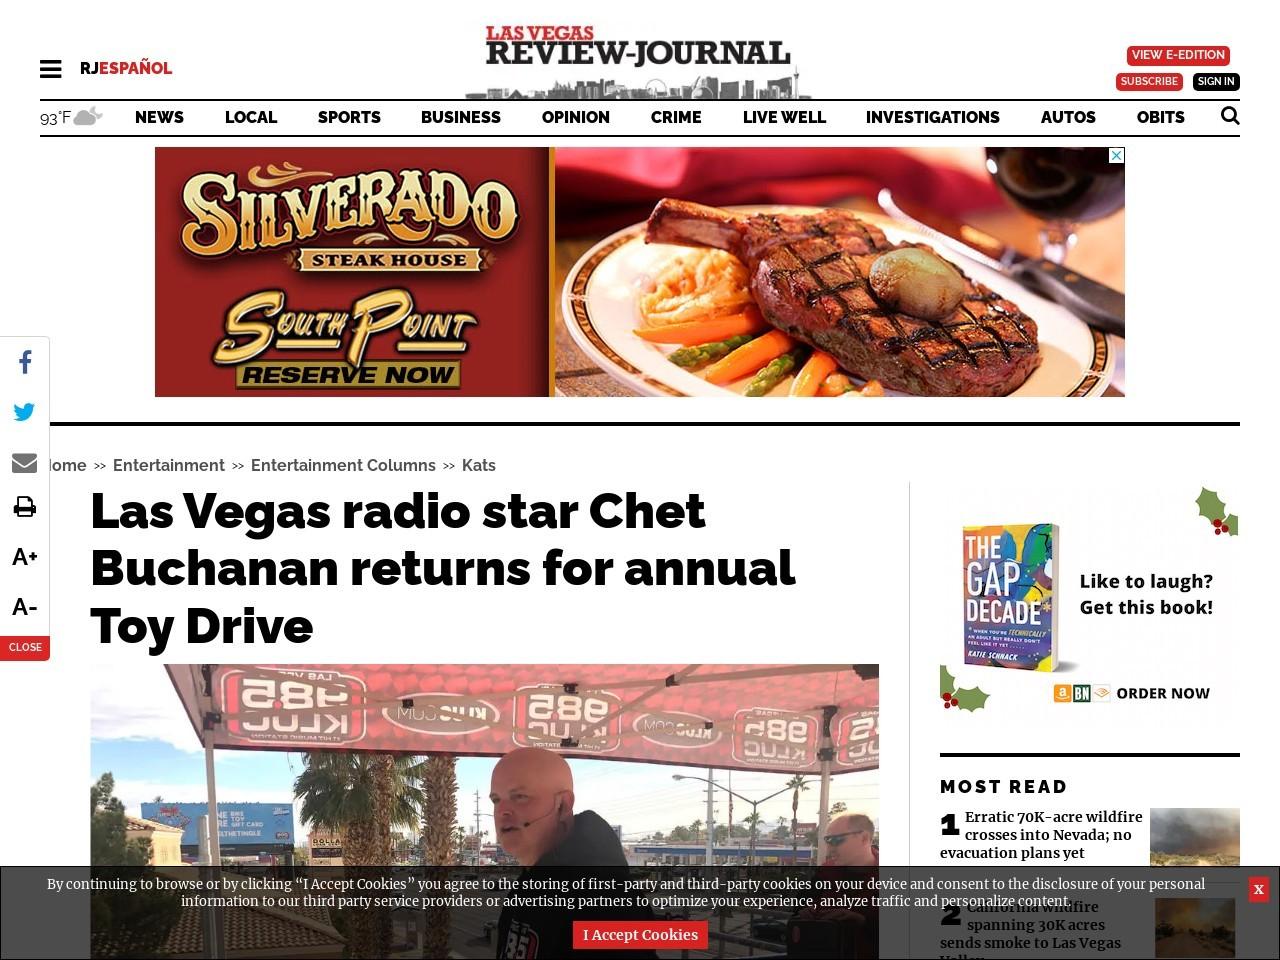 Las Vegas radio star Chet Buchanan returns for annual Toy Drive